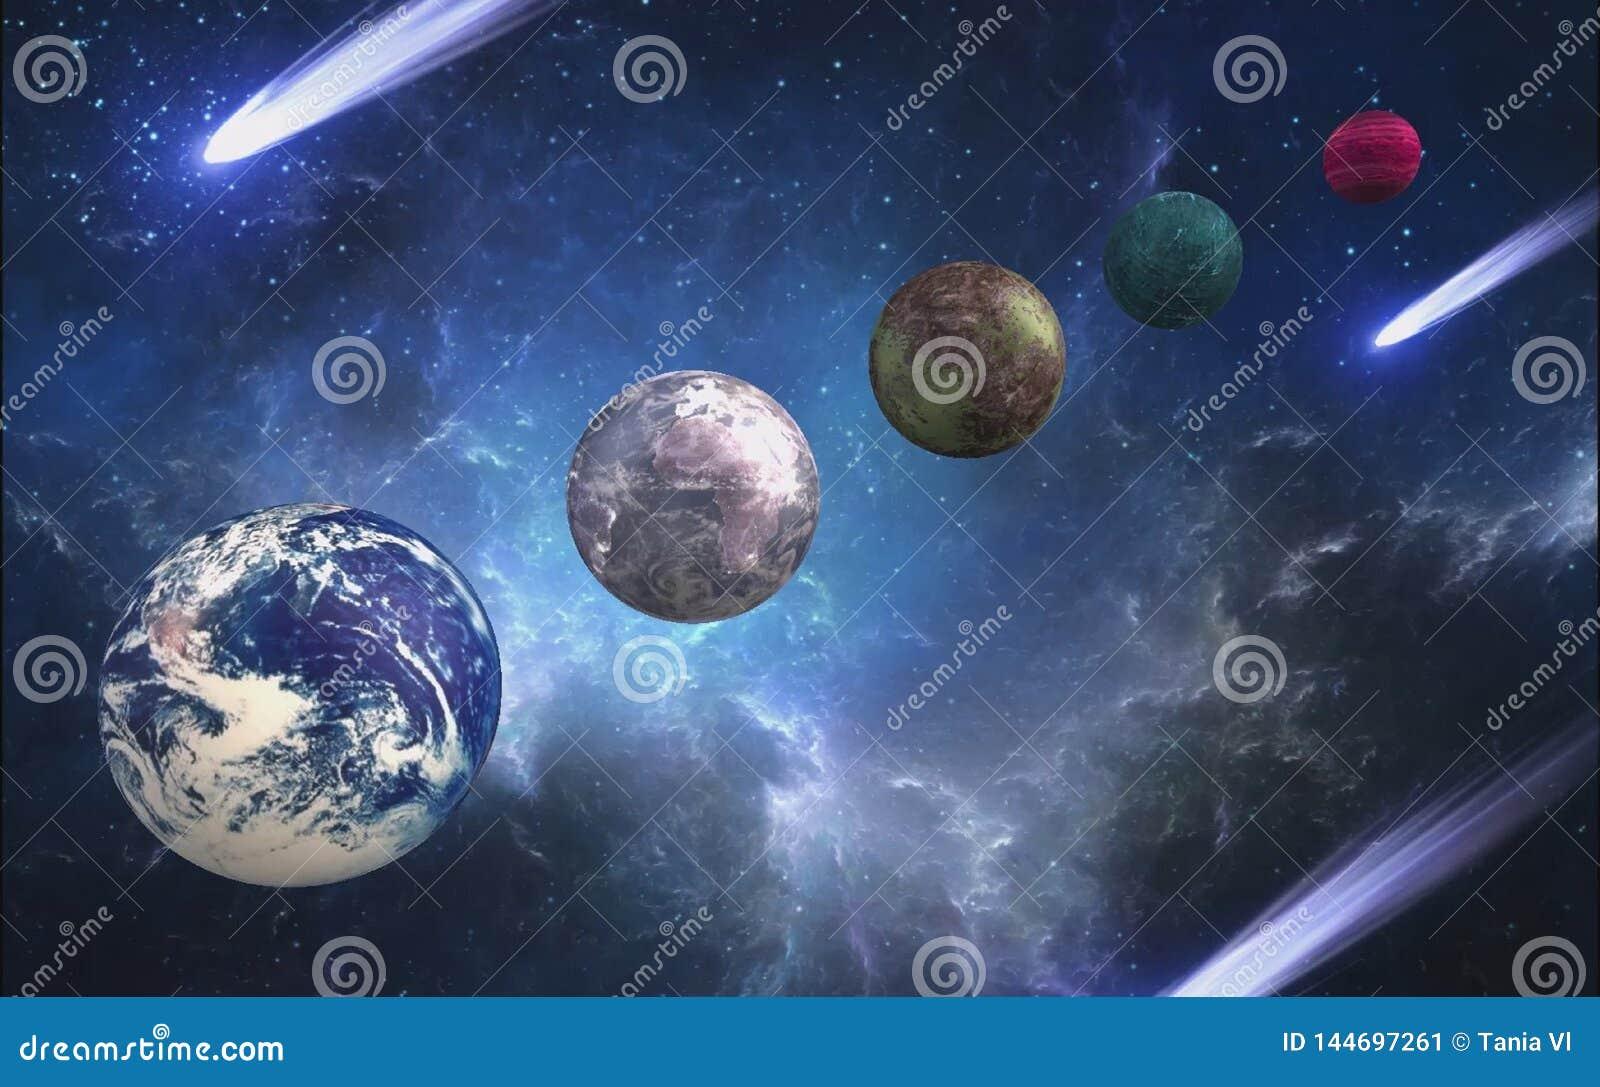 Olika planeter i universumet i formatet 3d